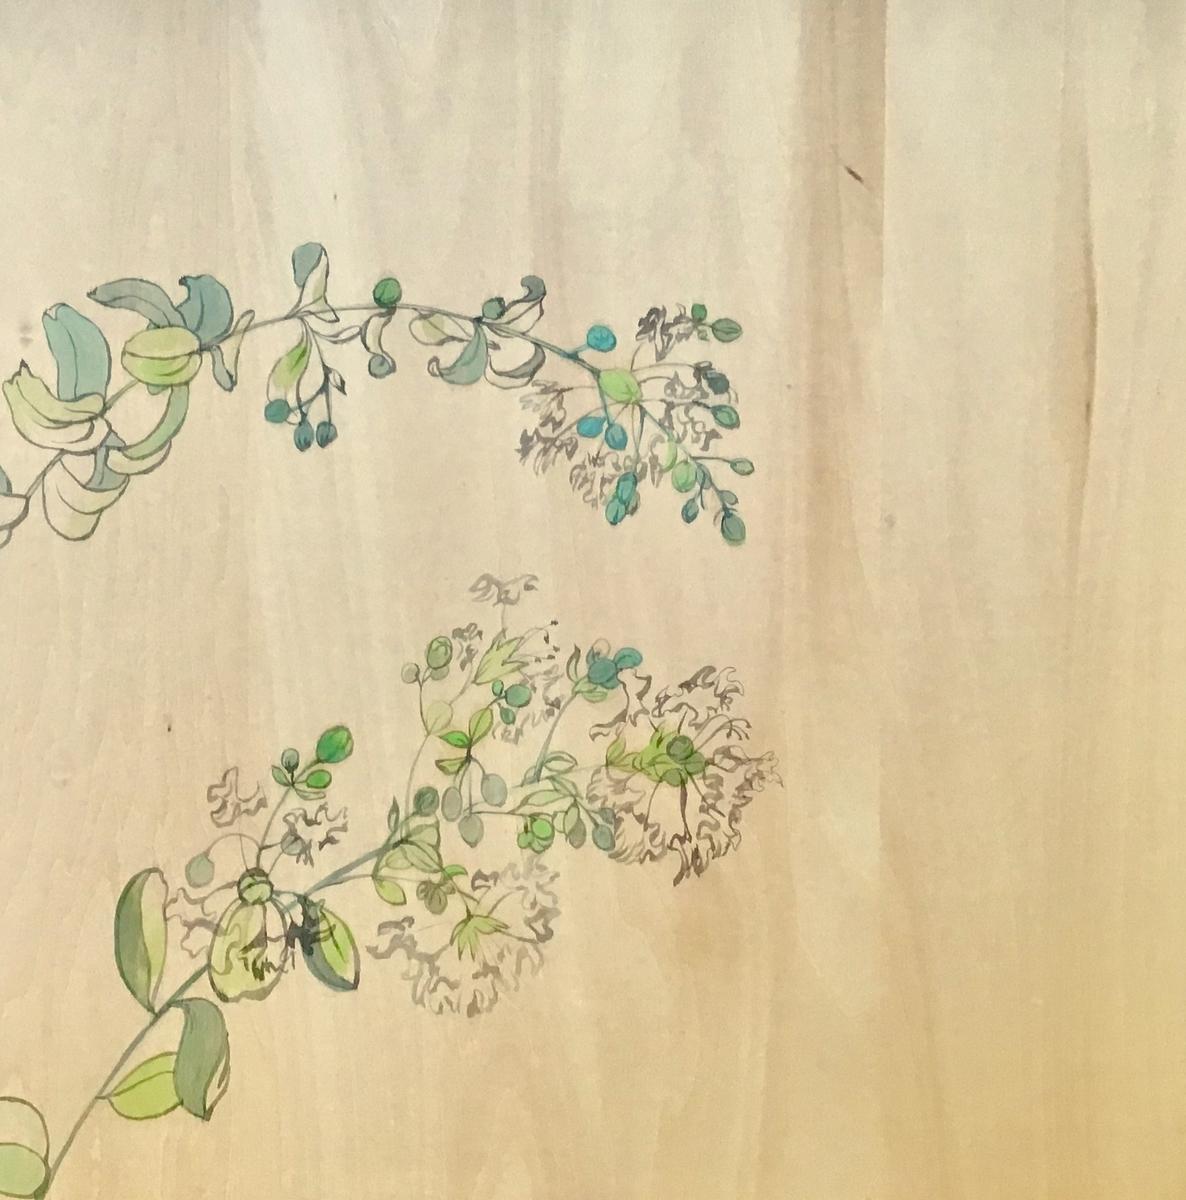 f:id:daikouji:20210630182404j:plain